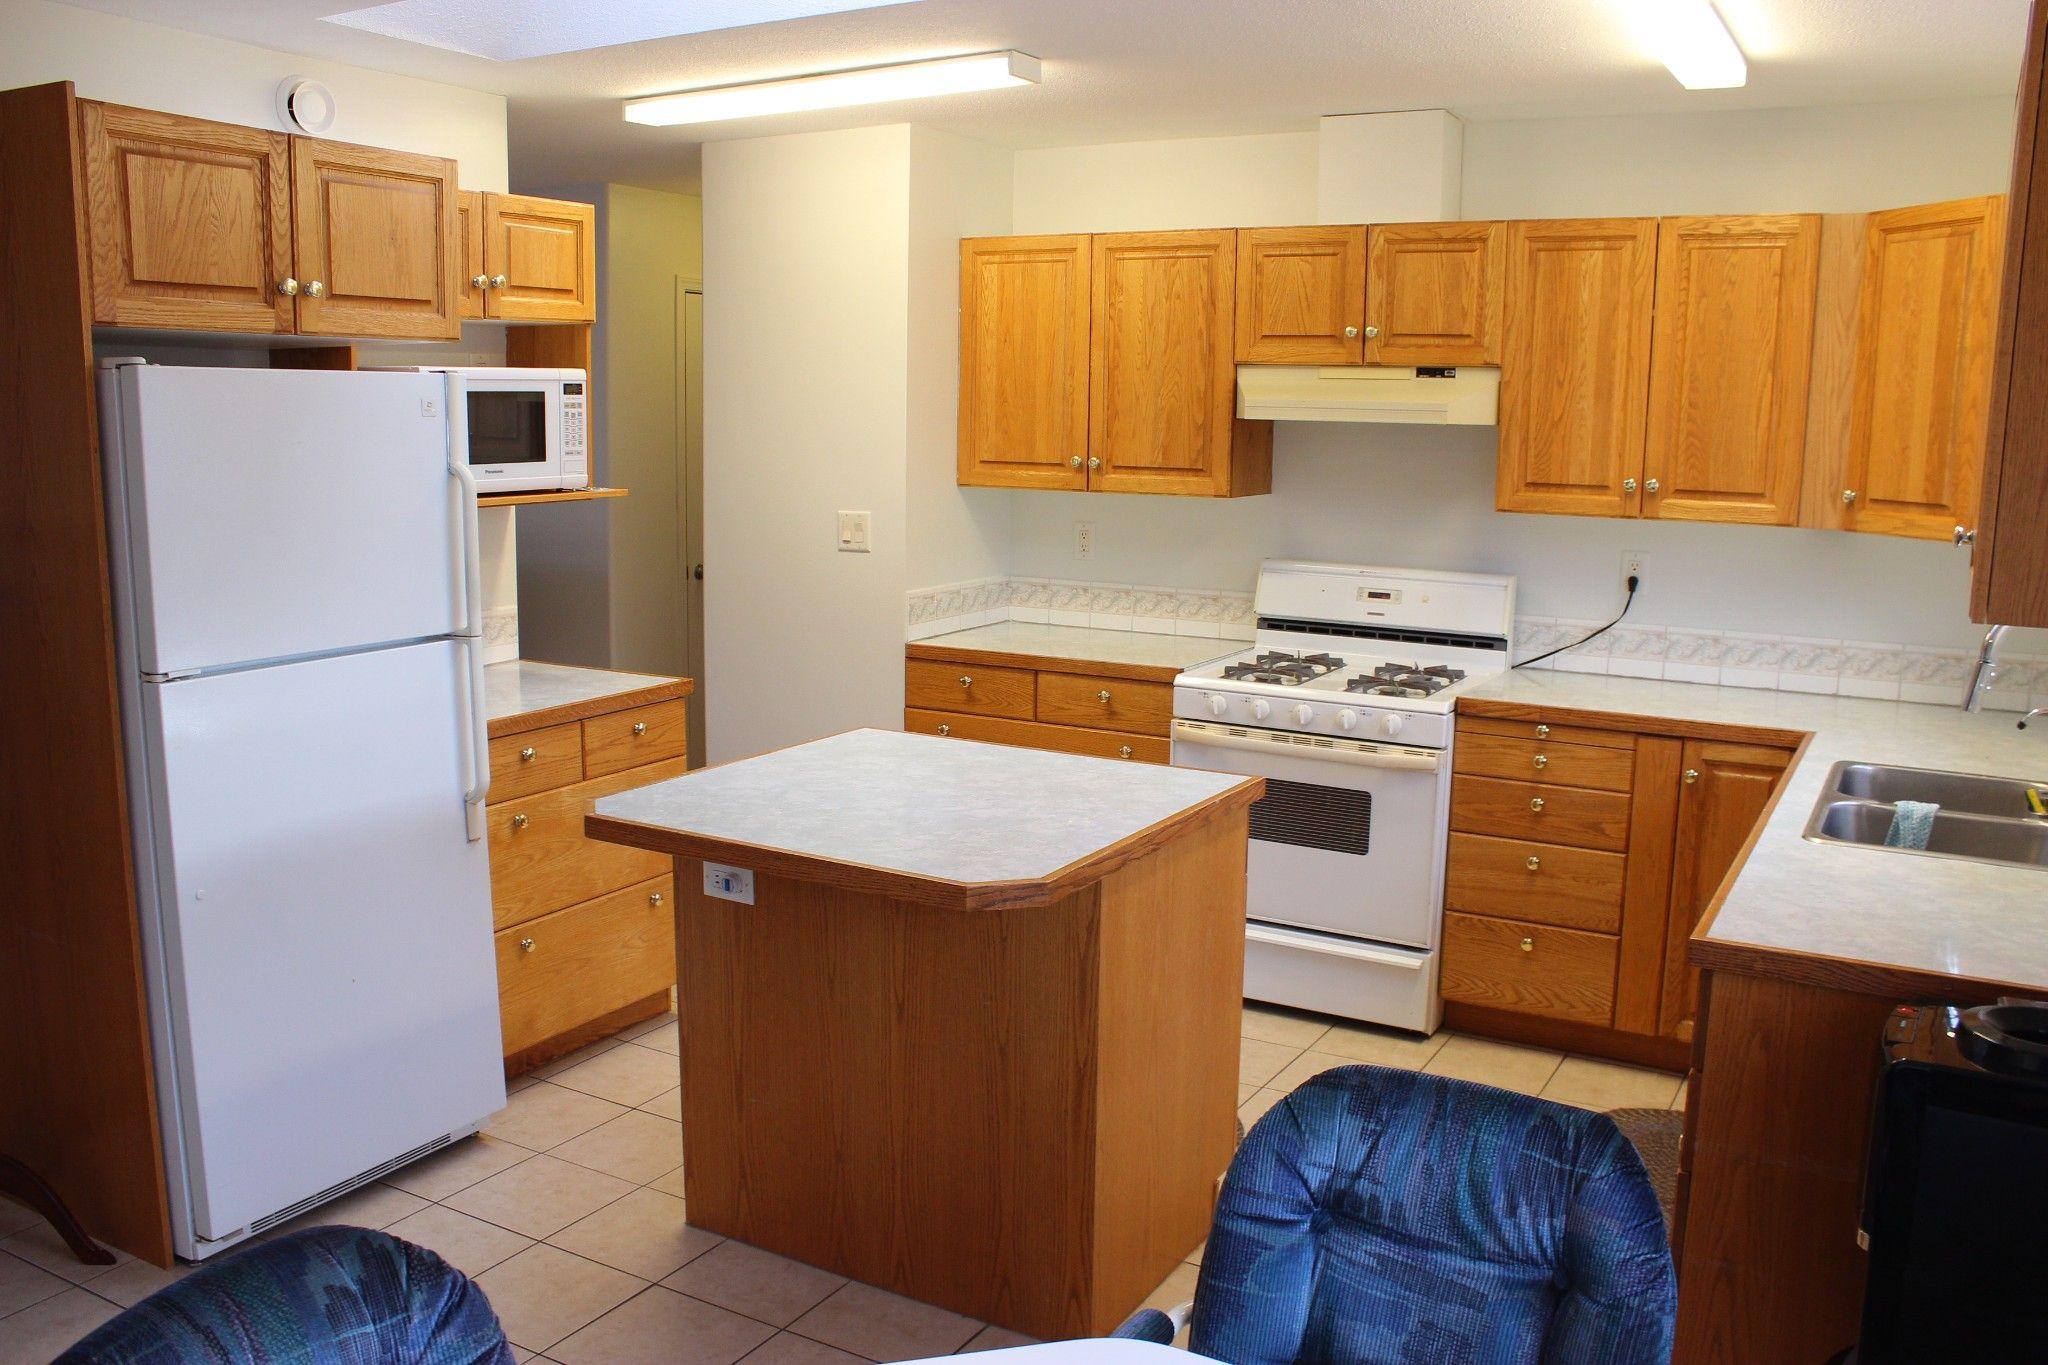 Photo 4: Photos: 6725 Heffley Road in Kamloops: Heffley House for sale : MLS®# 160007